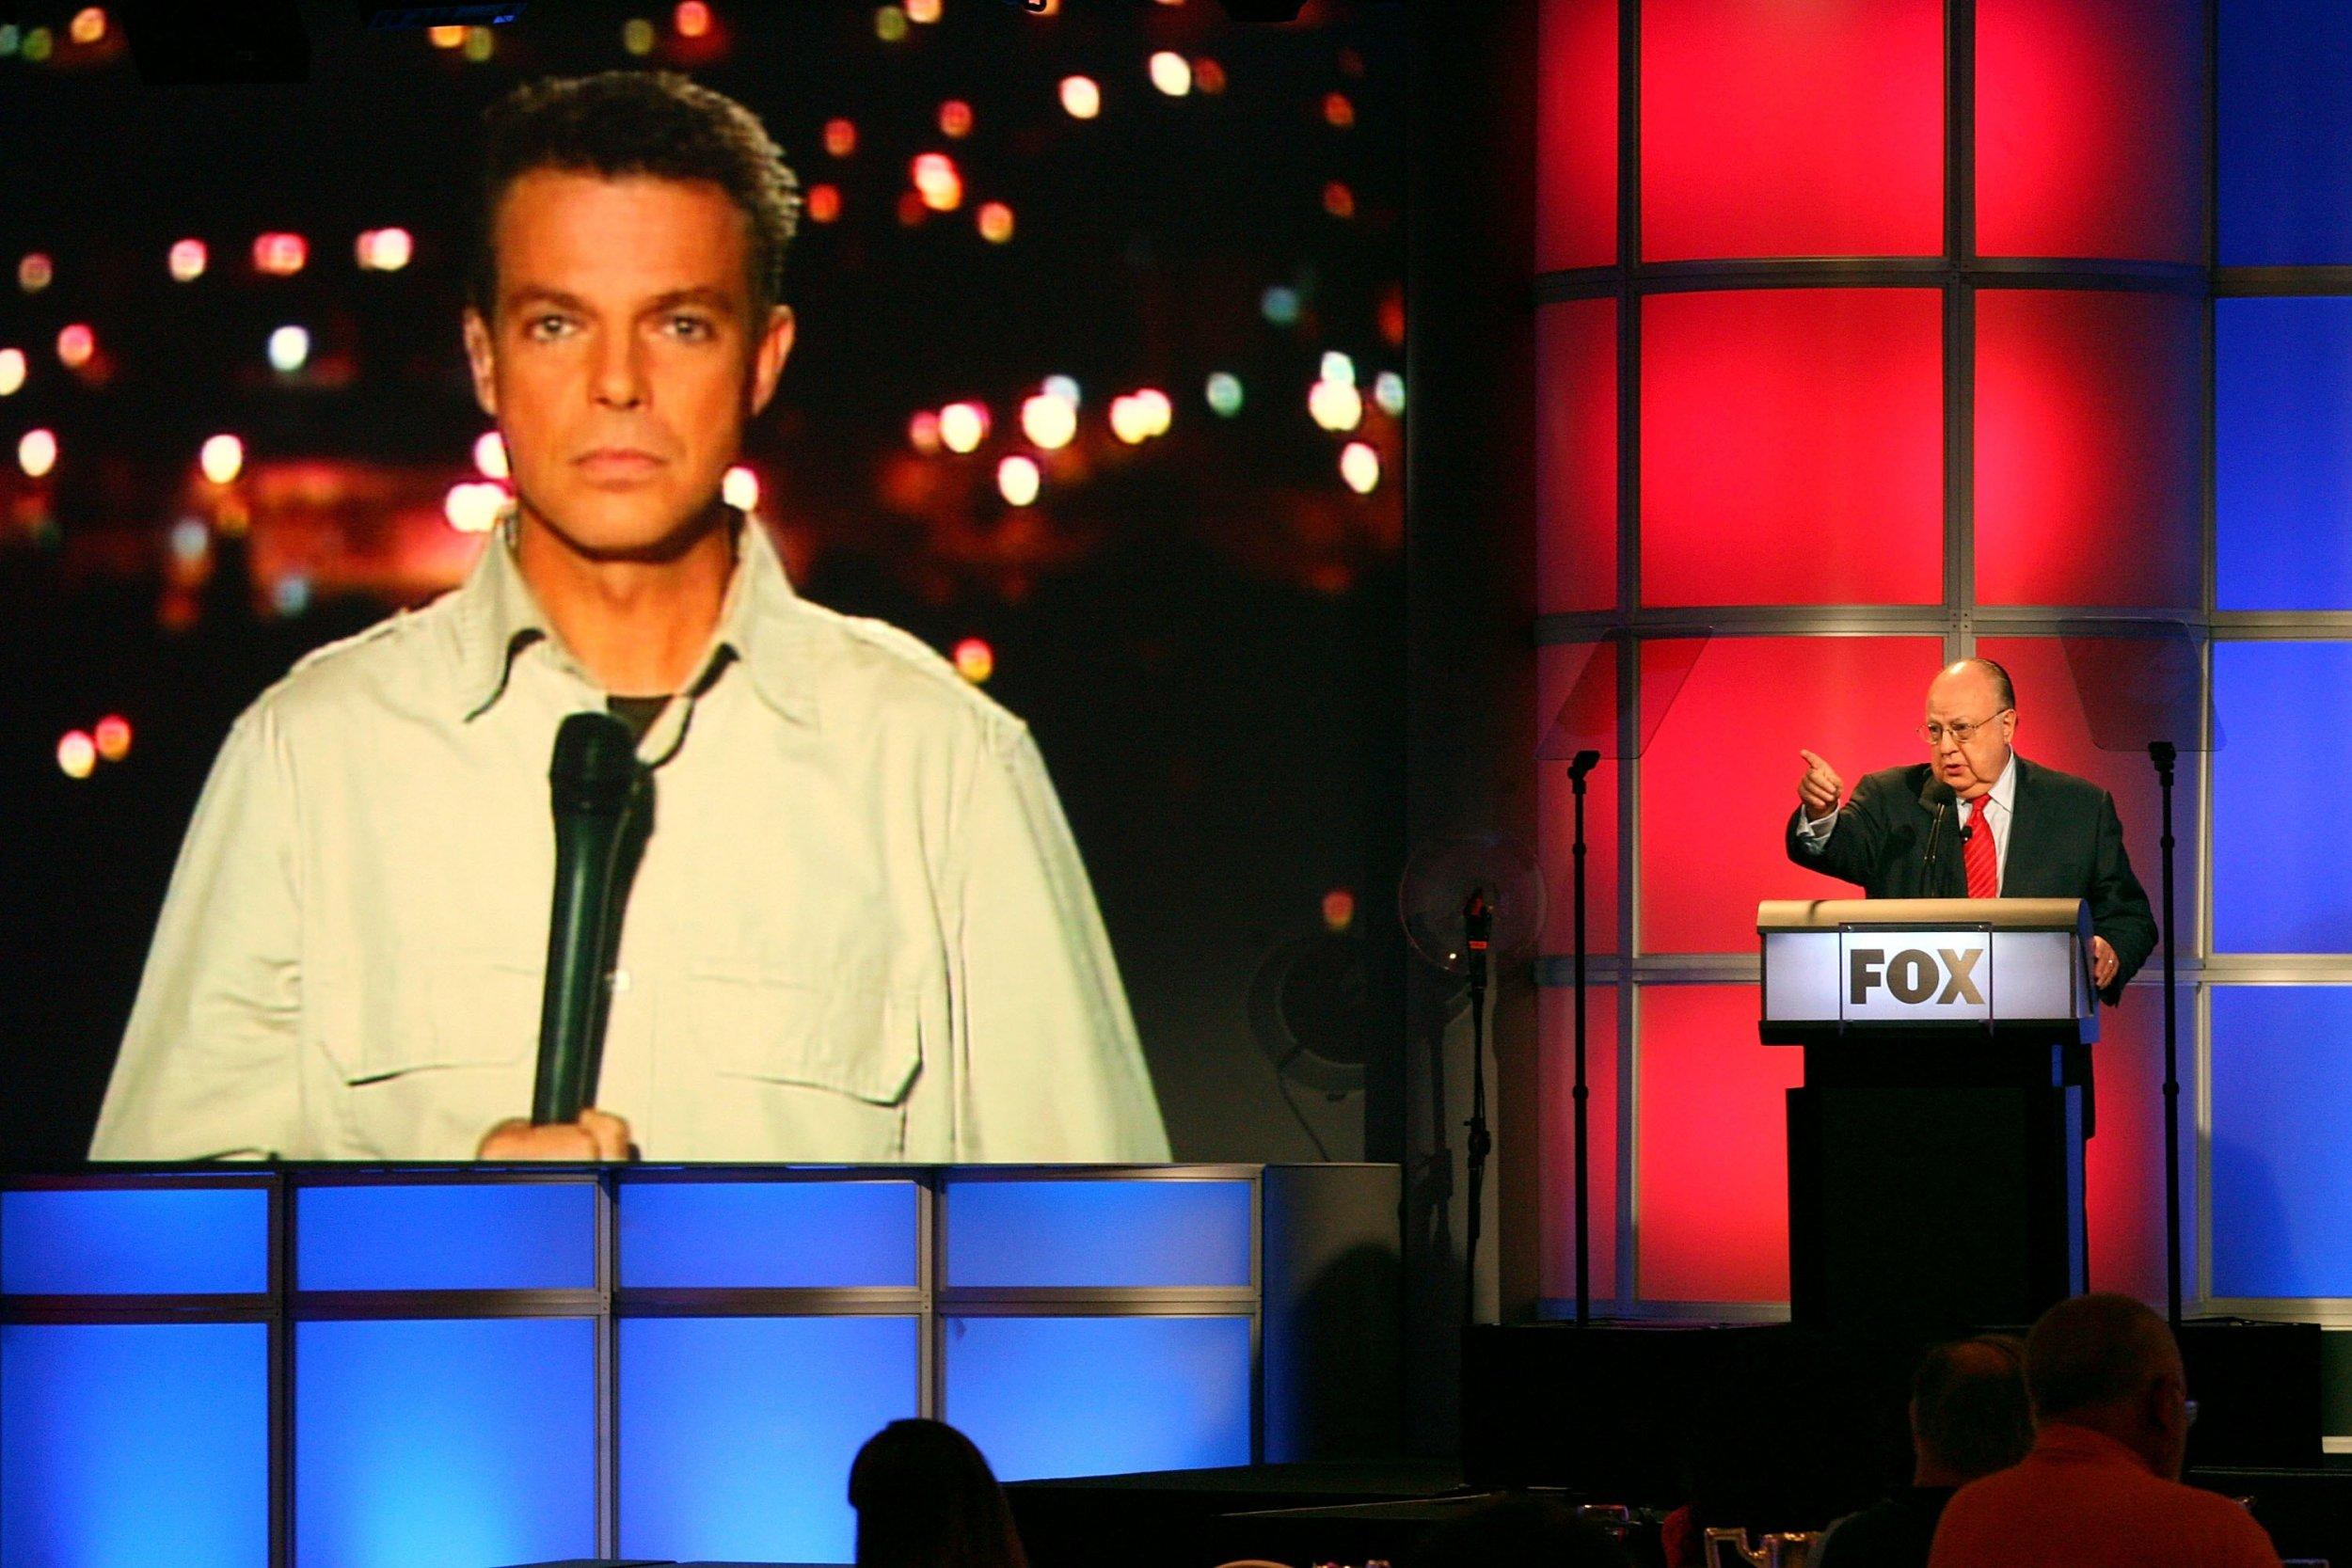 fox news host shepard smith, donald trump, saudi arabia